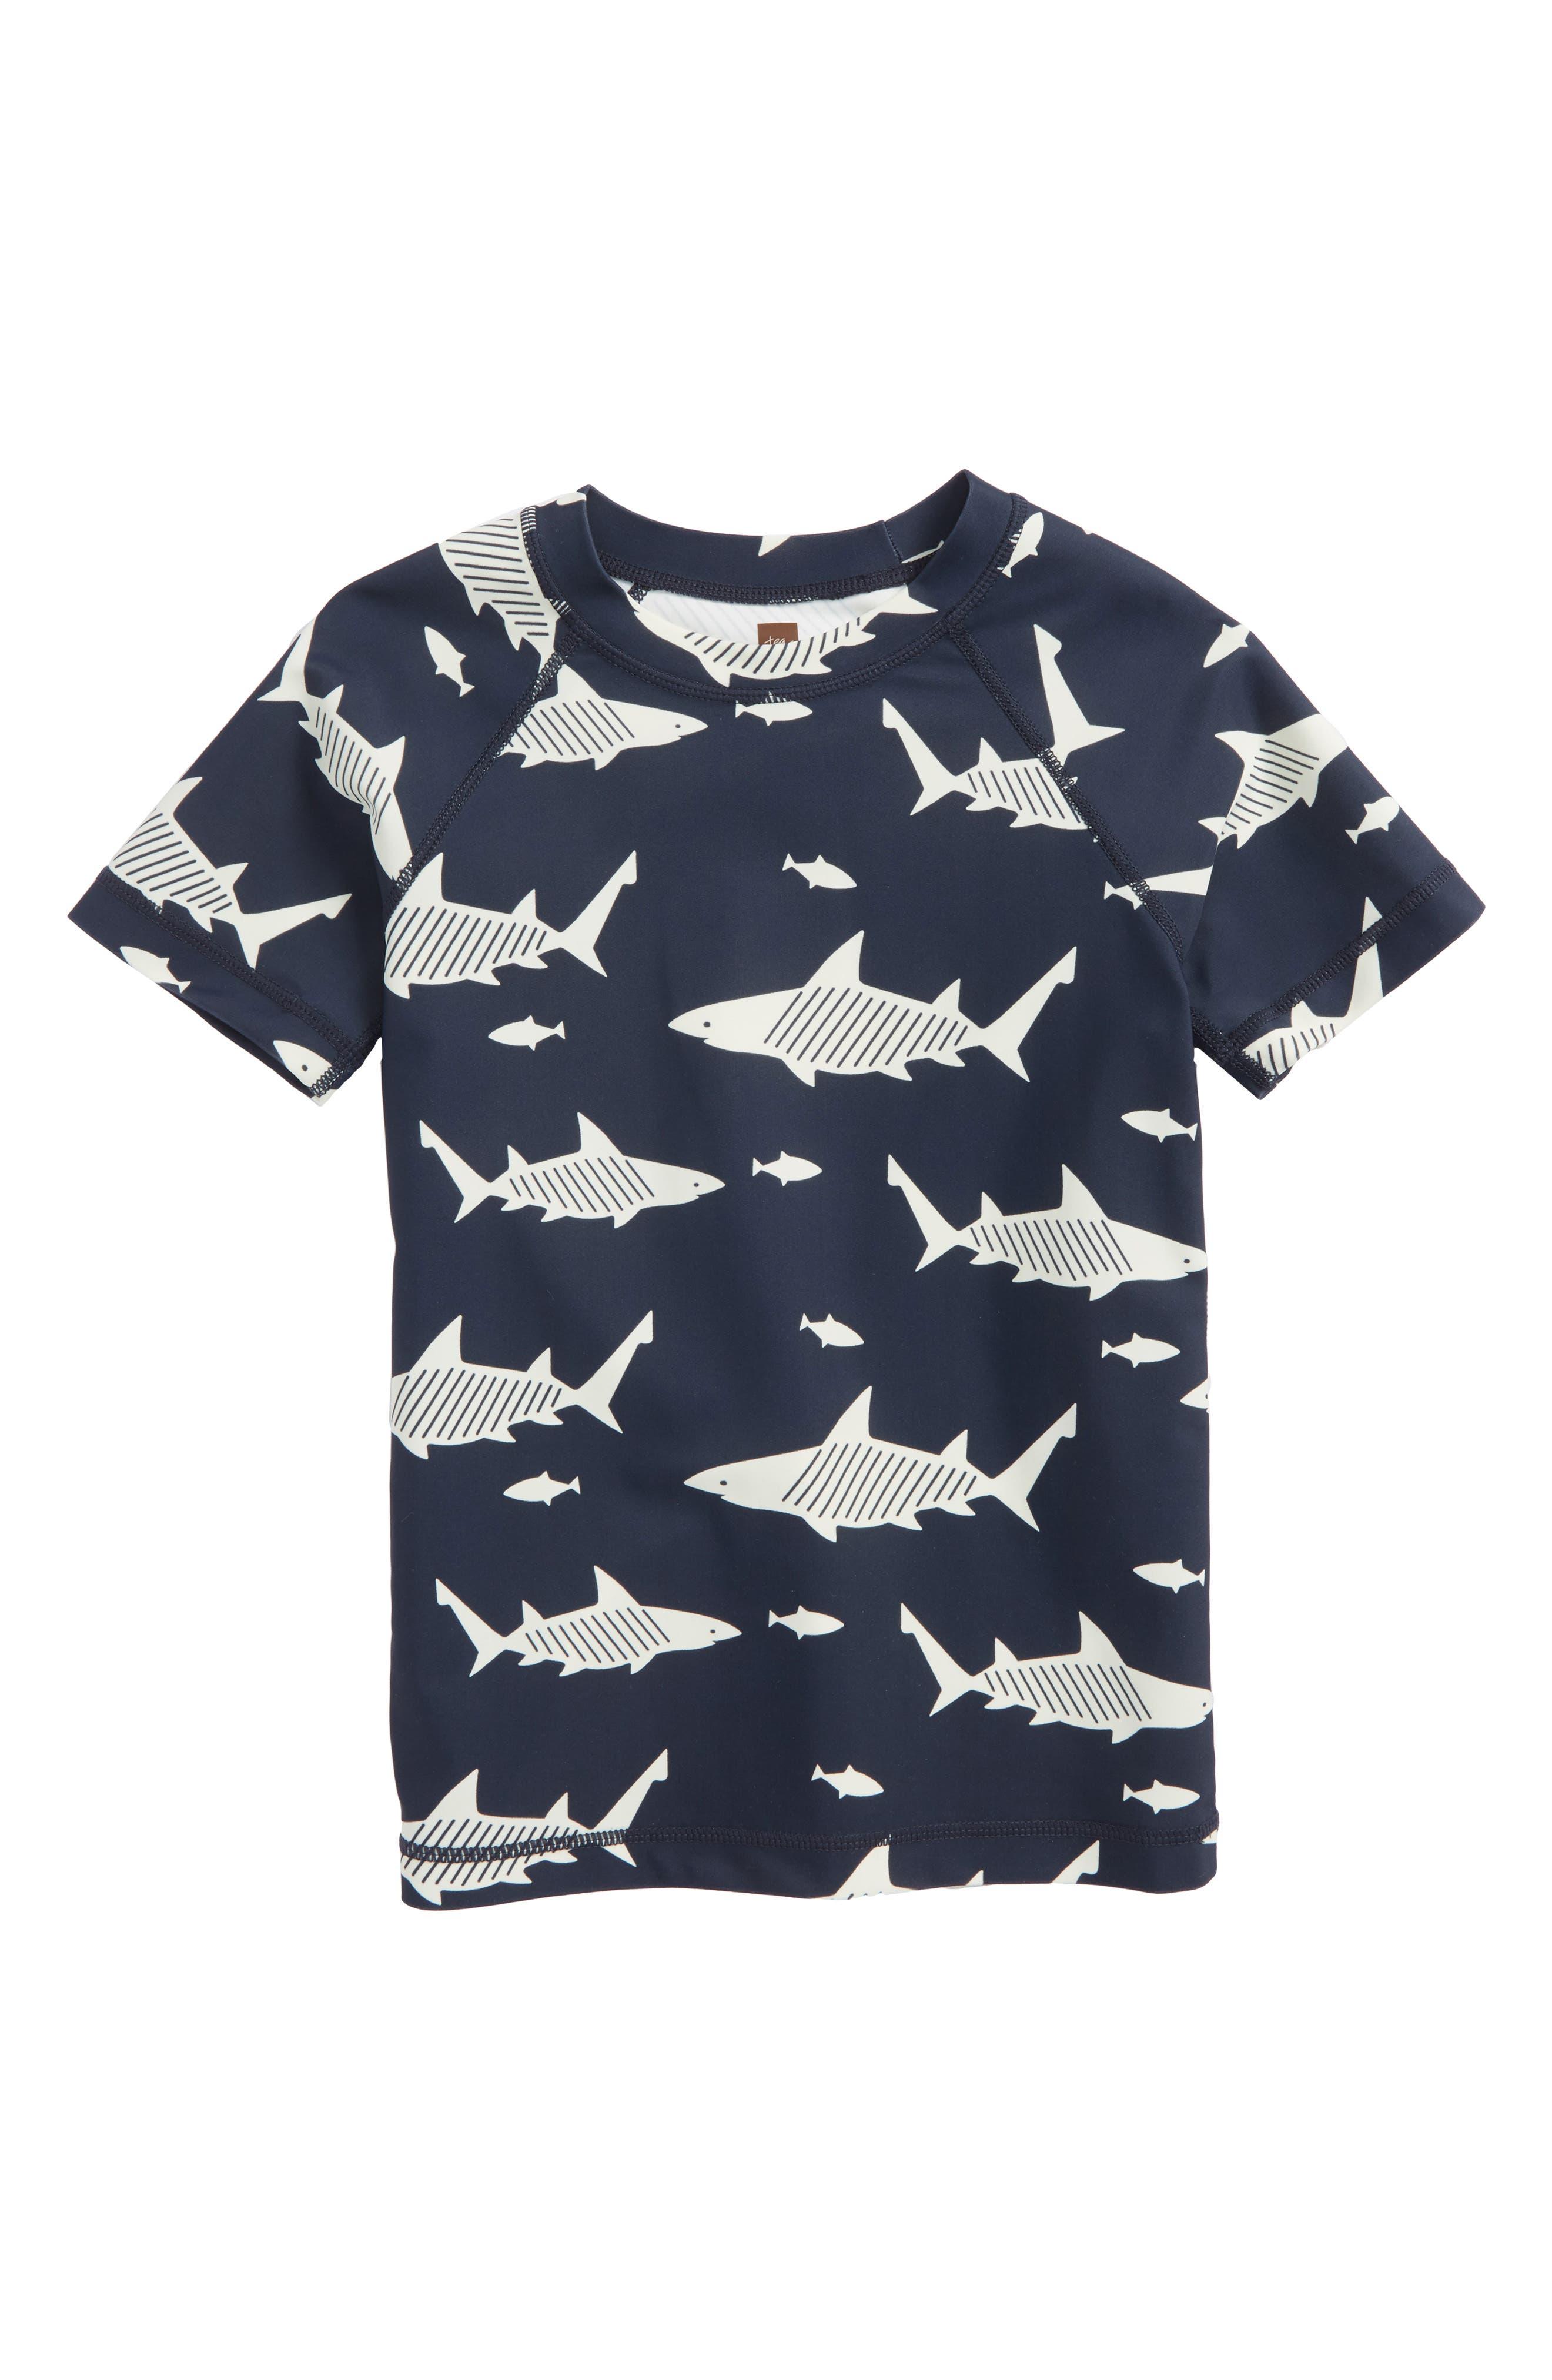 Shark Short Sleeve Rashguard,                         Main,                         color, 411